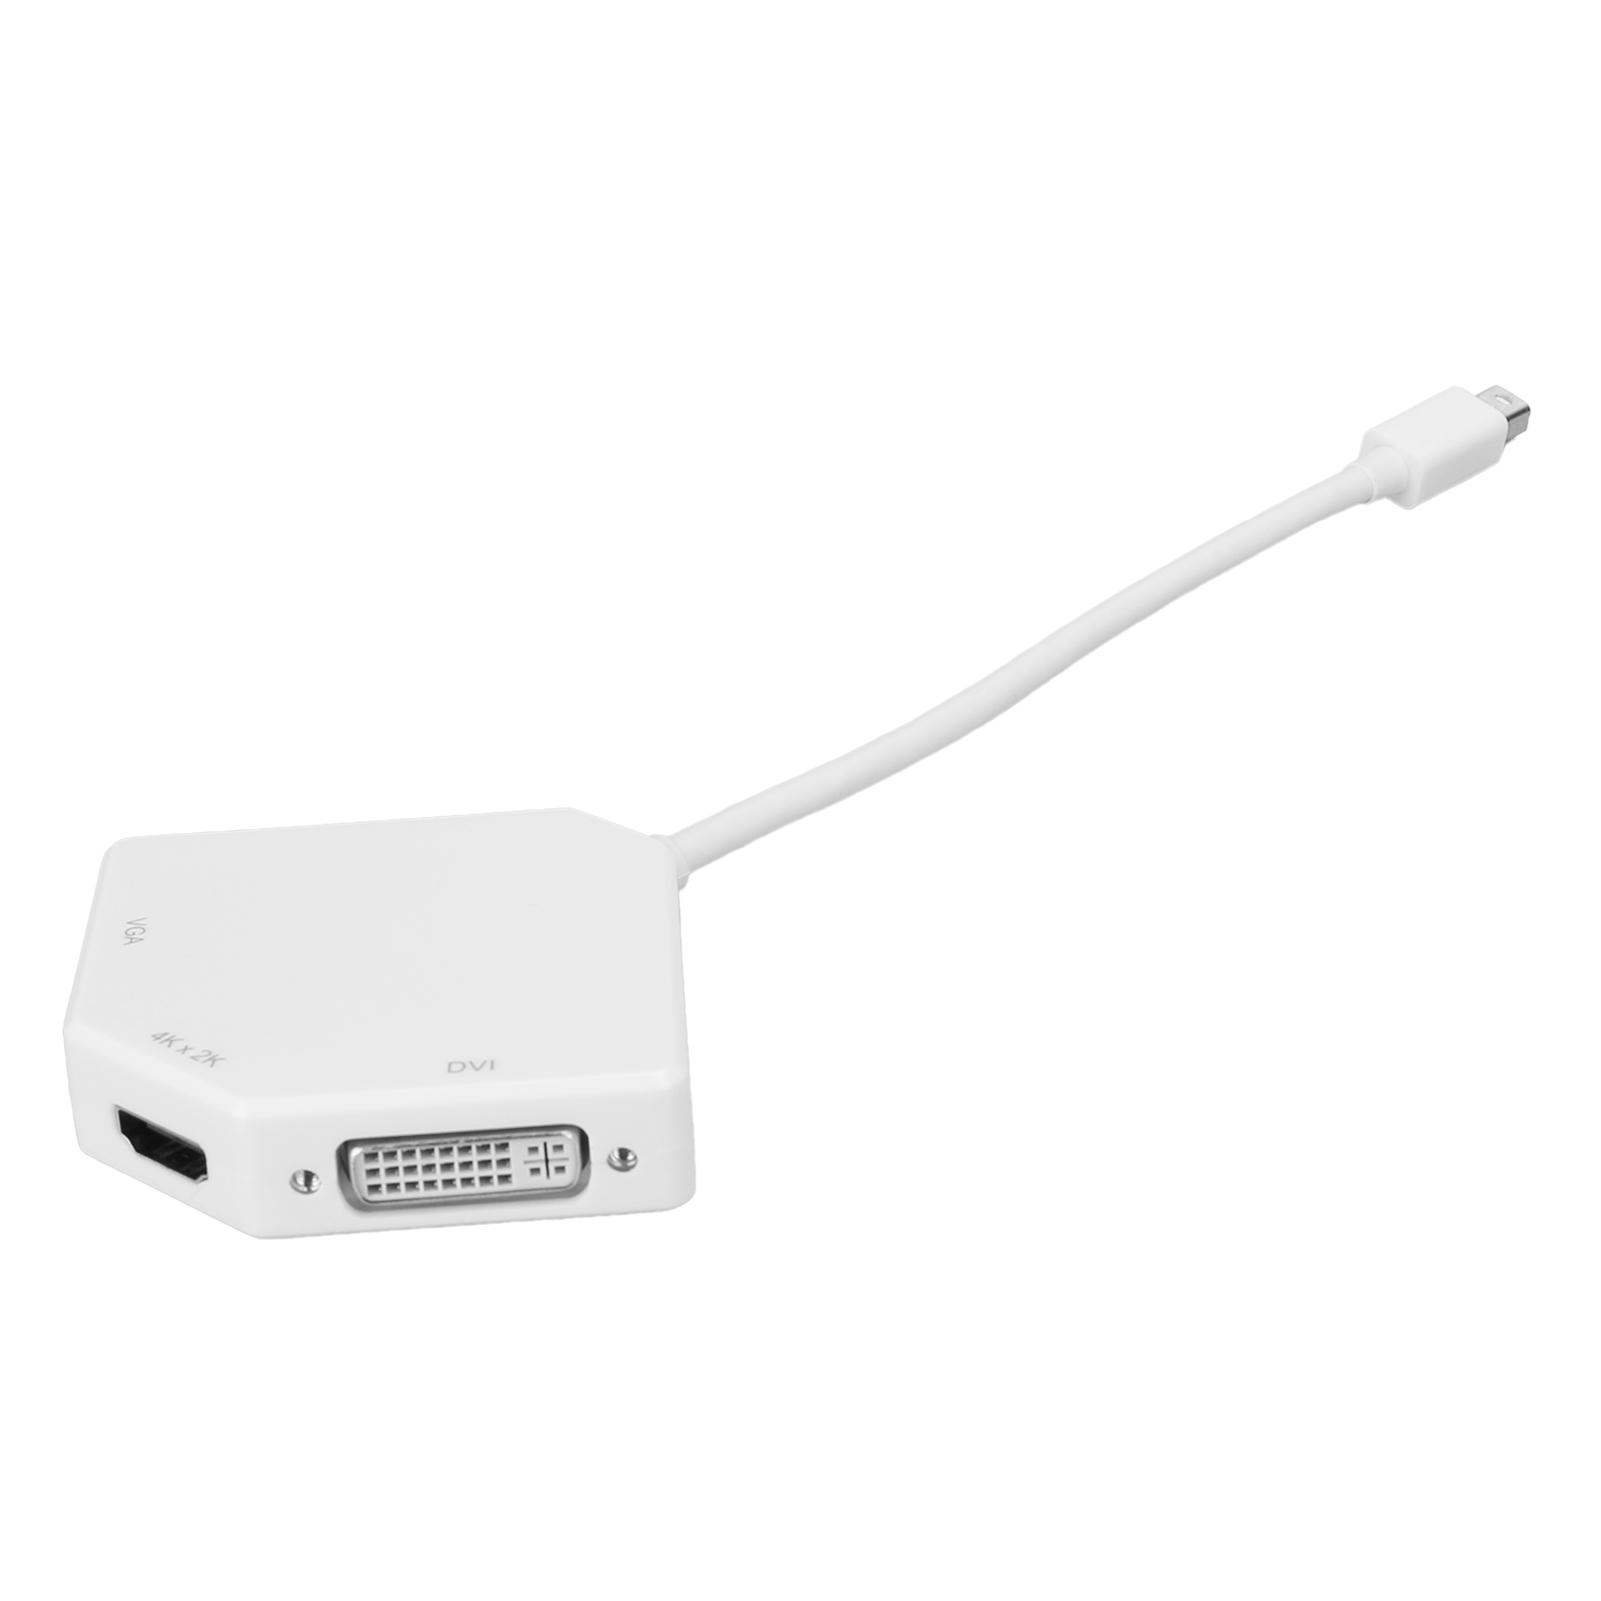 thumbnail 8 - Mini-DP-To-VGA-HDMI-DVI-Conveter-3In1-1080P-Video-Electronic-Adapter-White-B0404